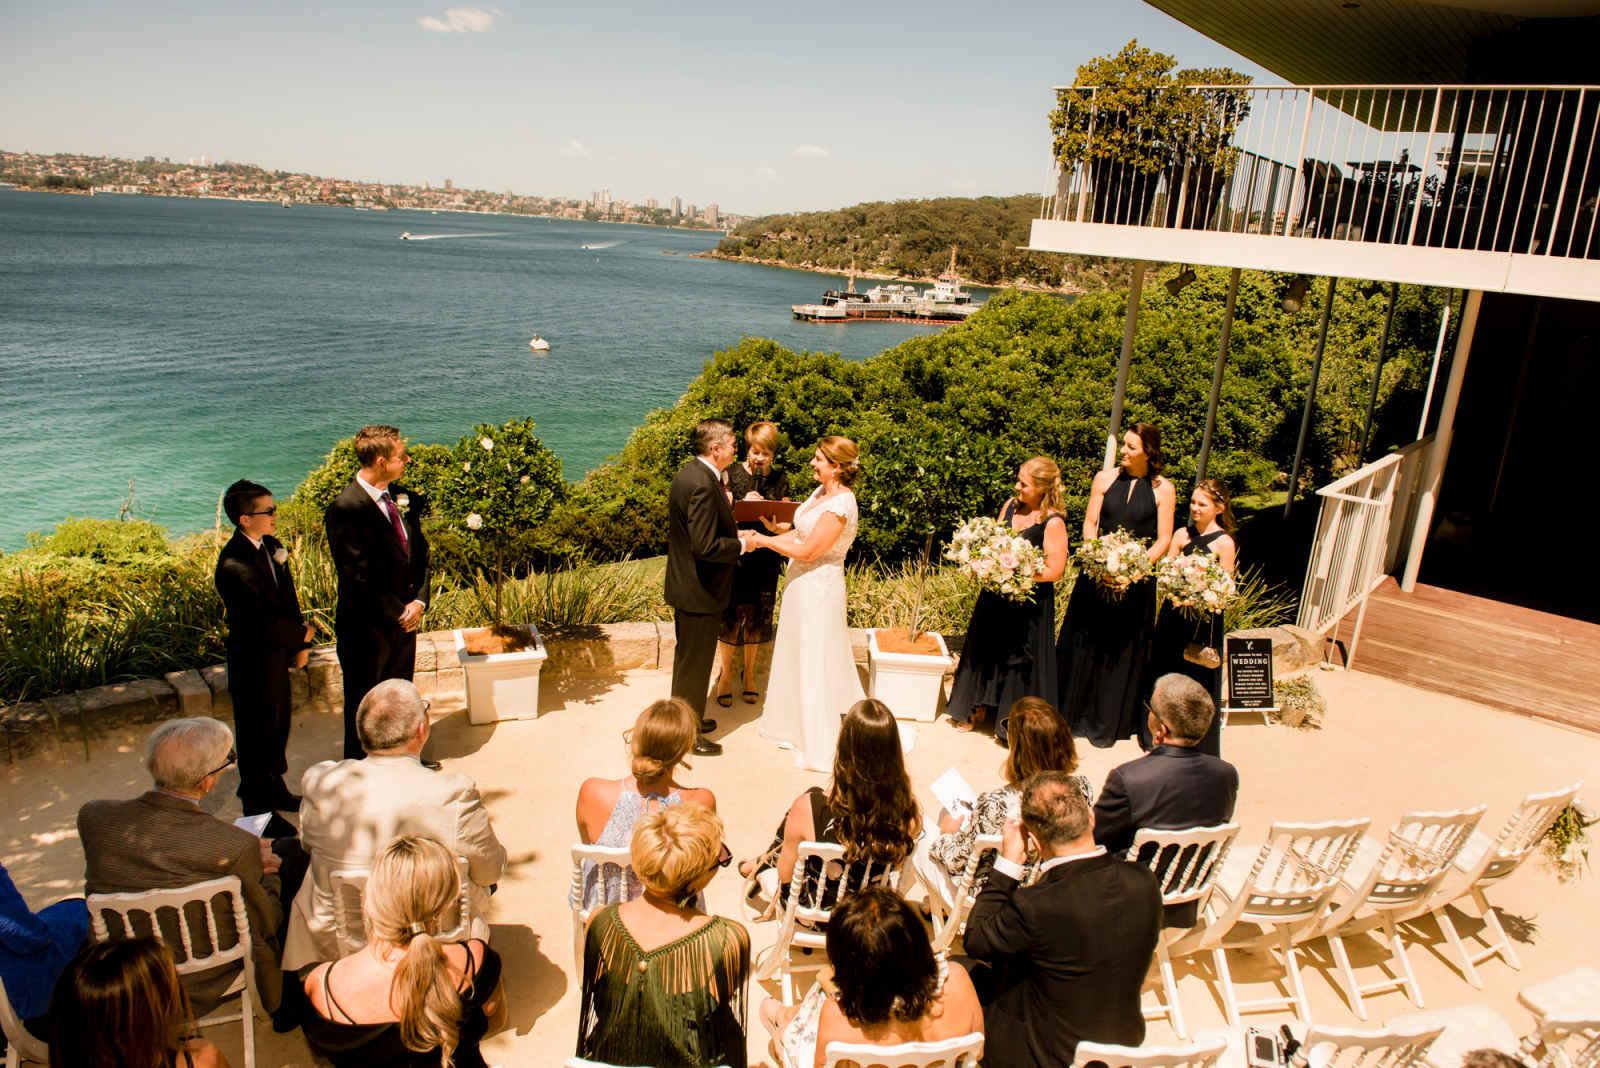 wedding ceremony ouside sergeants mess